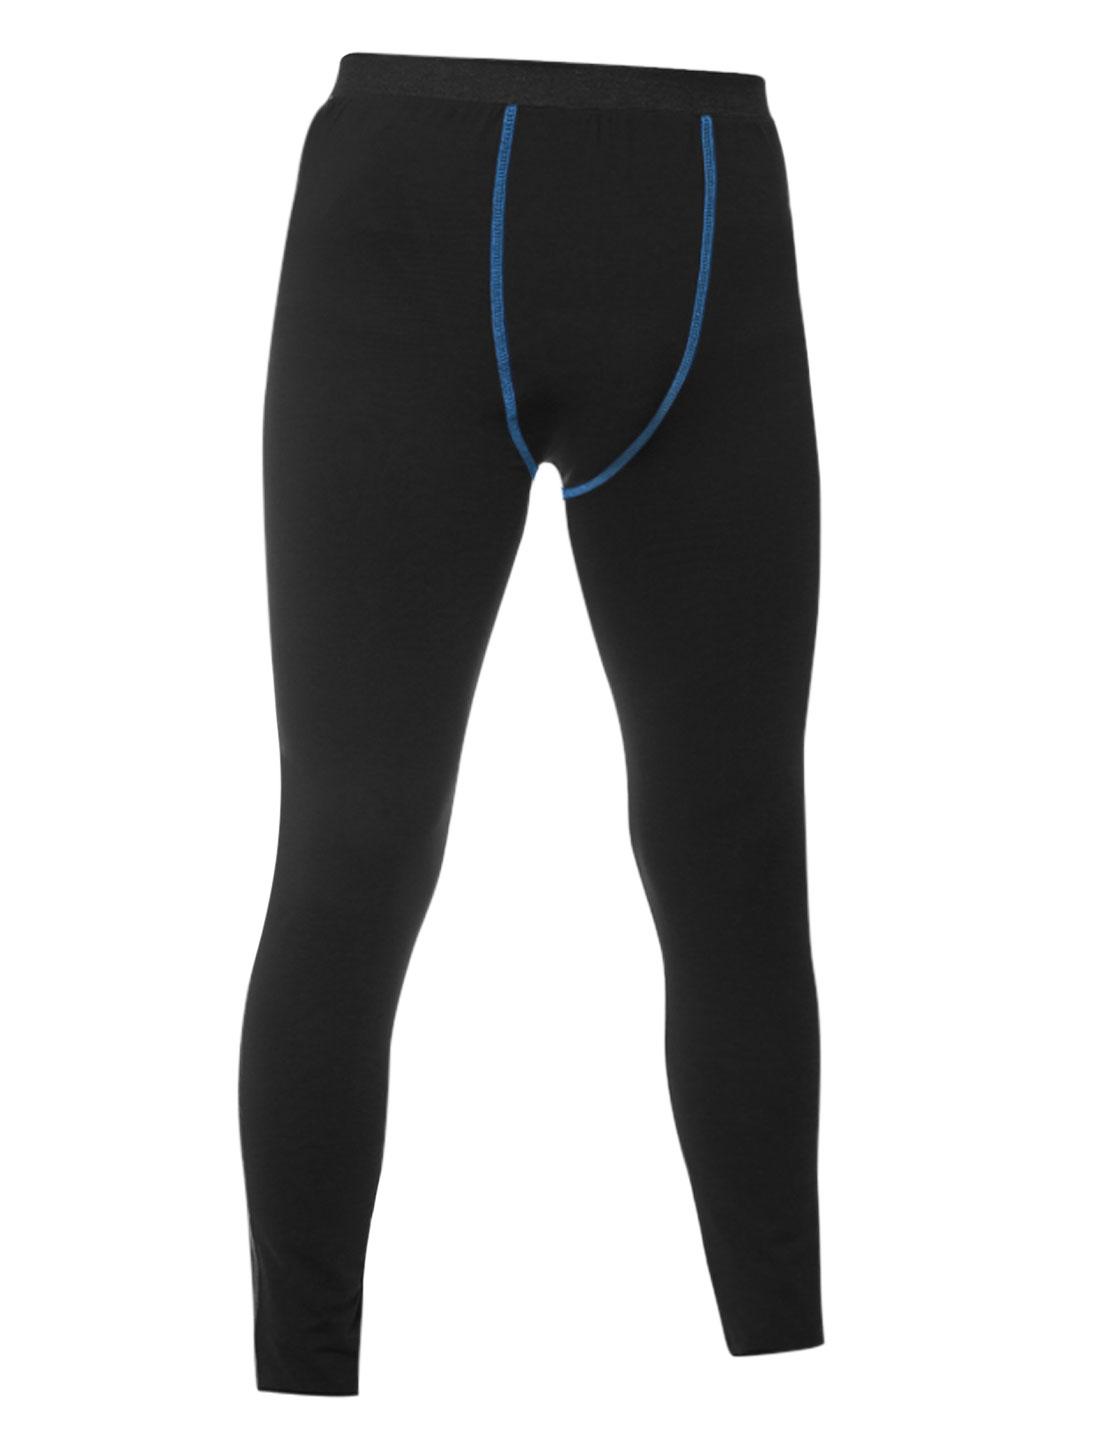 Men Elastic Waistband Seam Decor Skin Tight Compression Pants Black W32